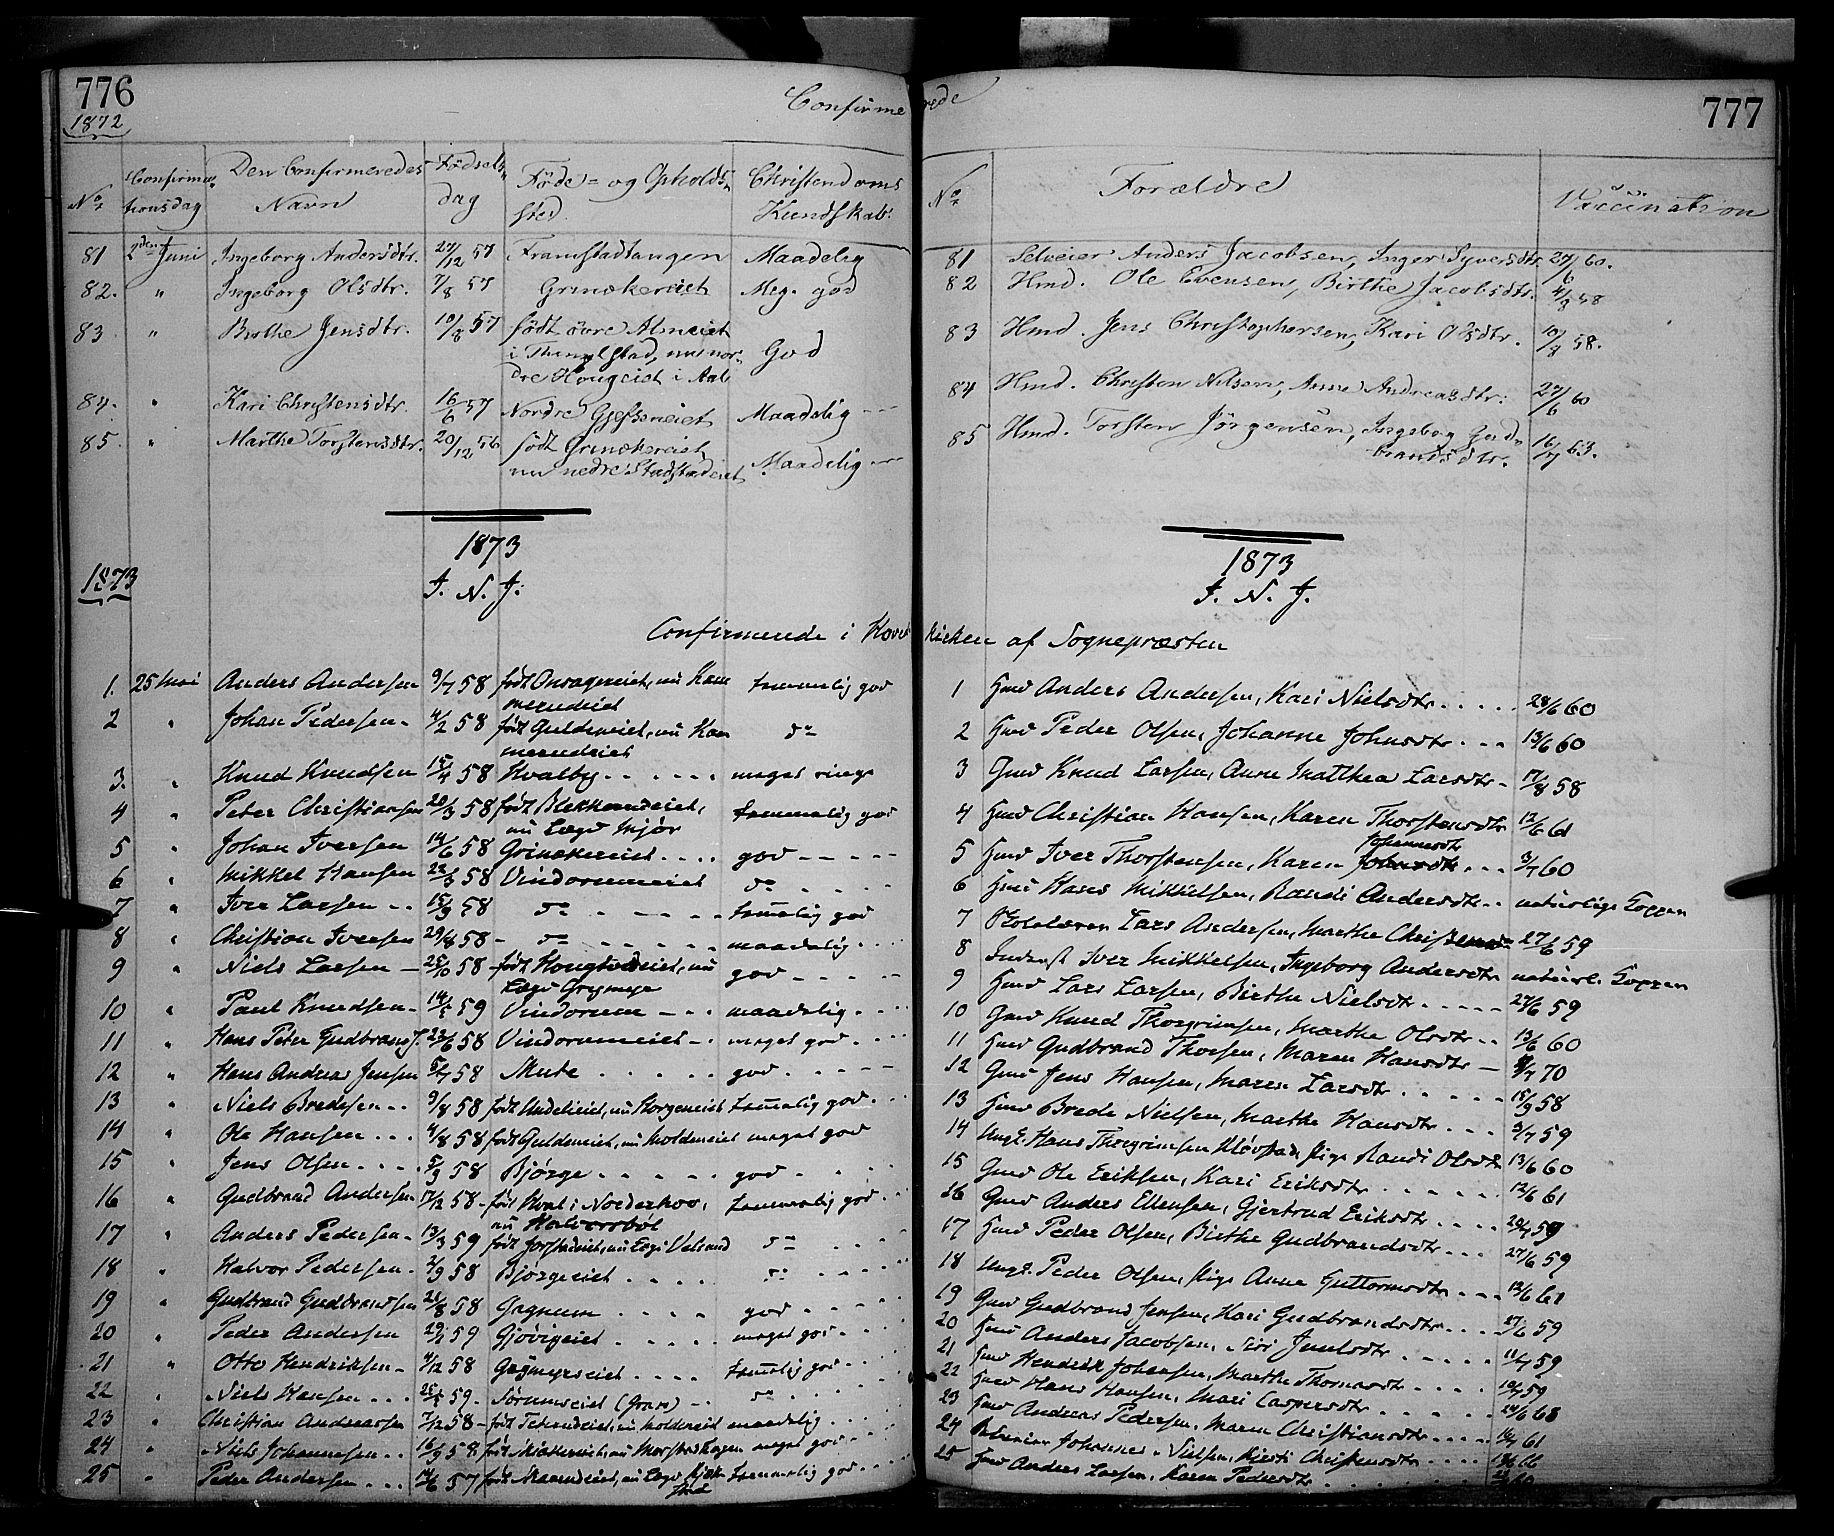 SAH, Gran prestekontor, Ministerialbok nr. 12, 1856-1874, s. 776-777